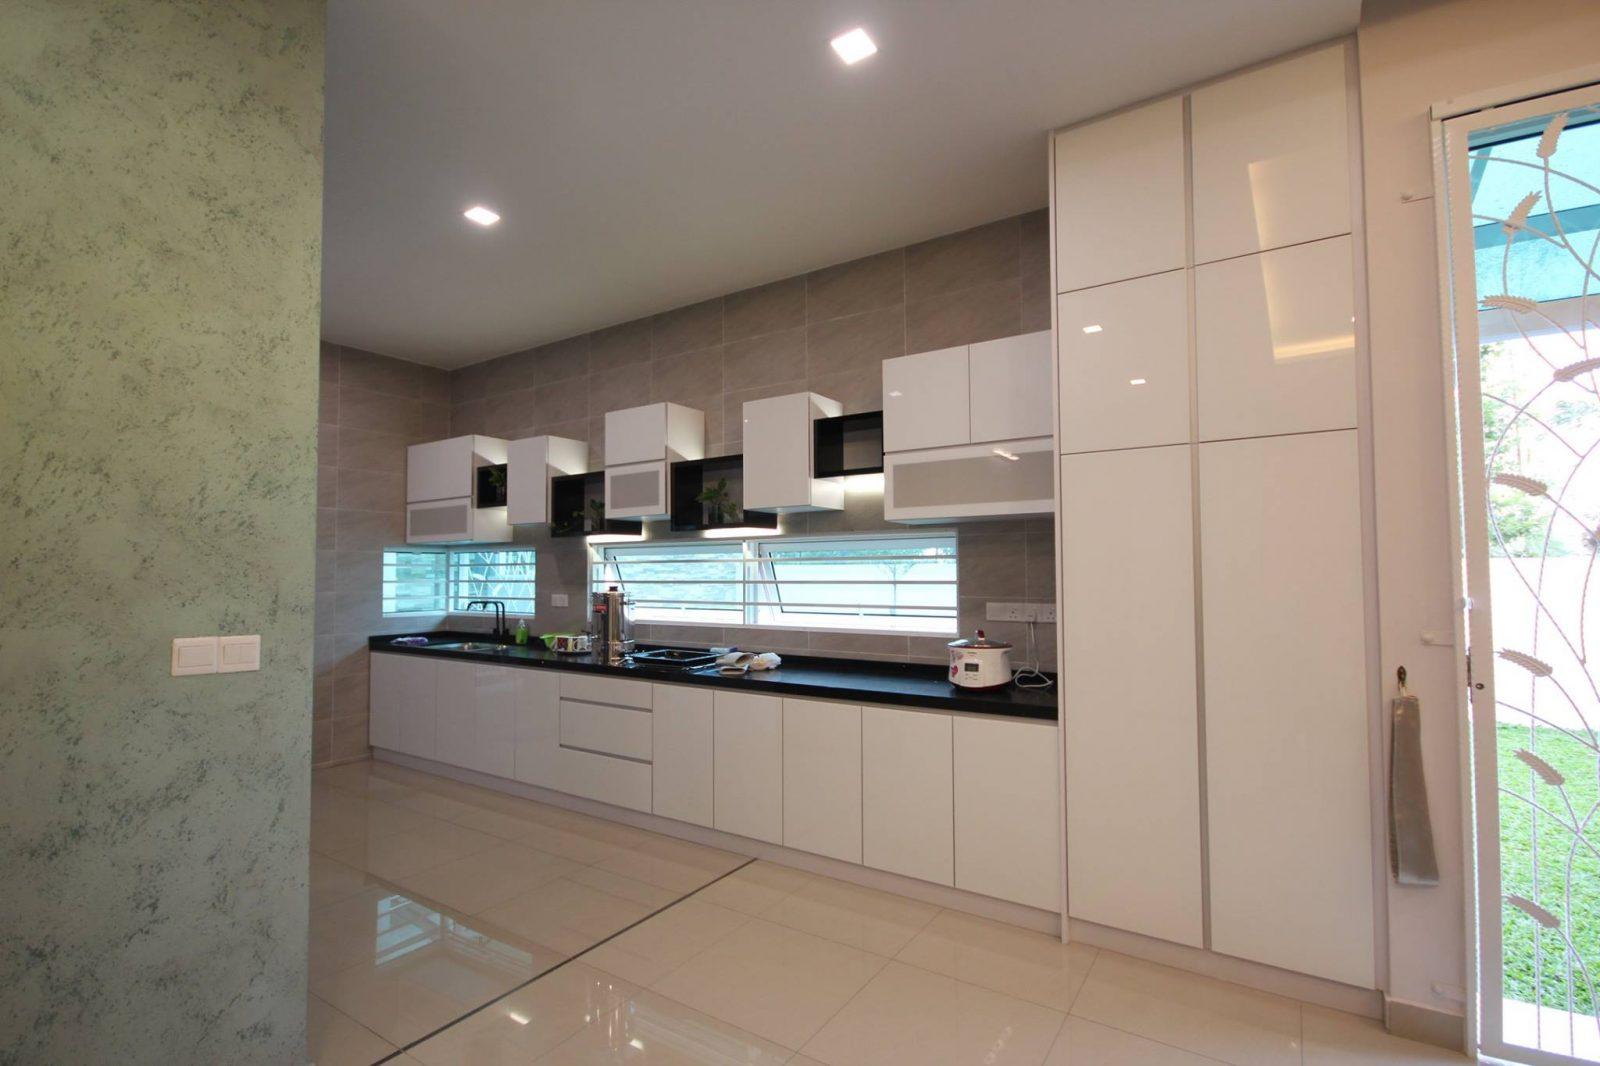 customised kitchen layout for a long kitchen design by alecc interior design - Kcheninnovationen Inkl